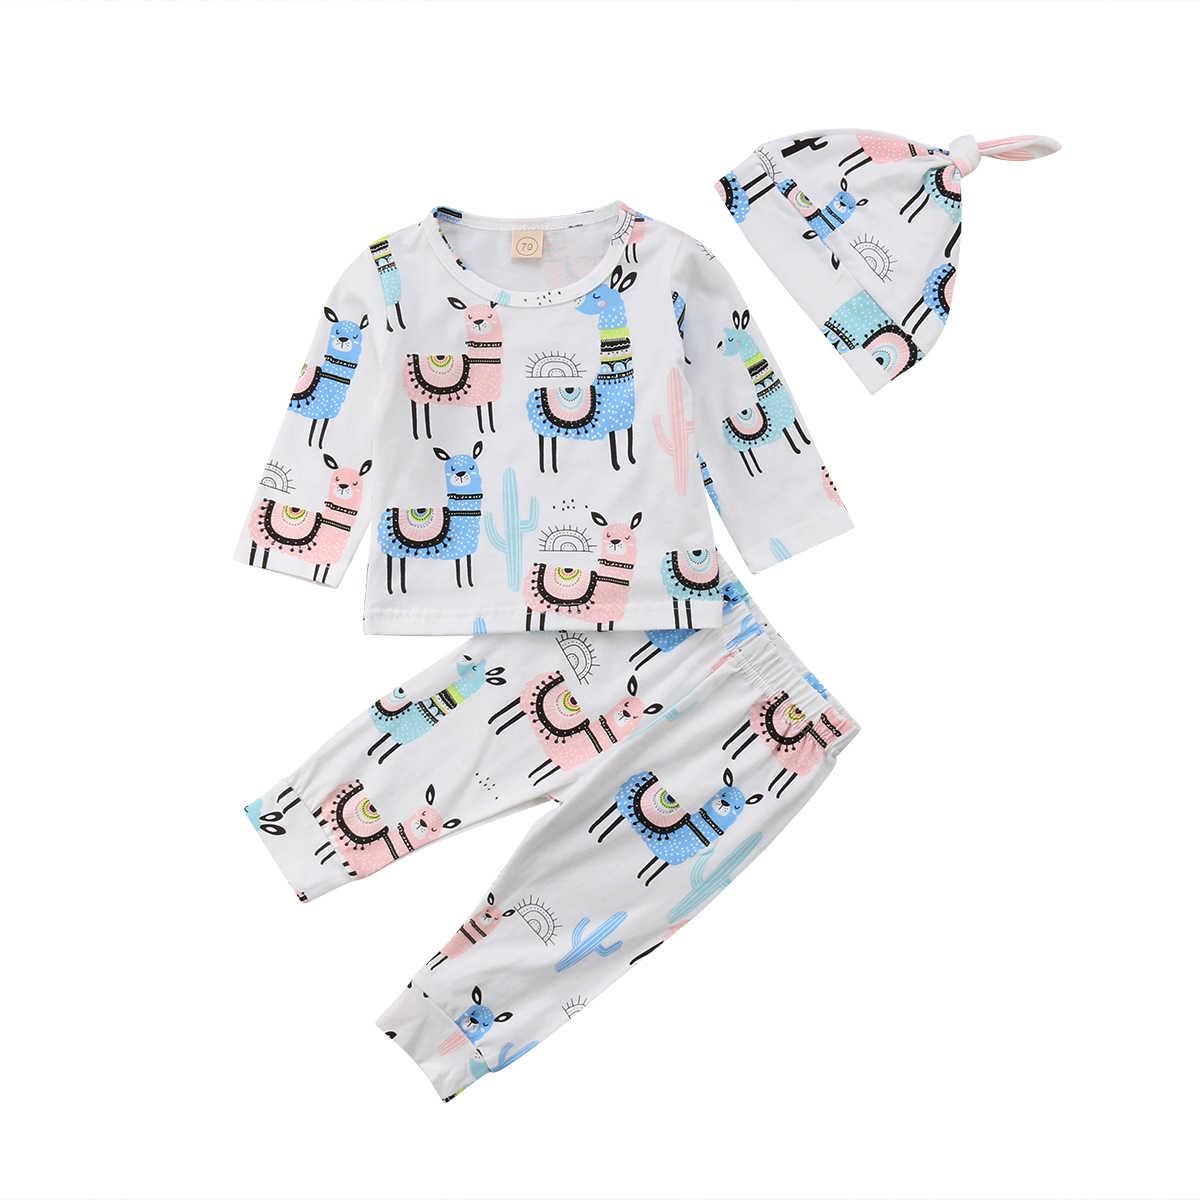 b3780bfe0c7f8 Cartoon Alpaca 3PCS Newborn Infant Baby Boy Girl Clothing Set Long Sleeve T  shirt +Pants +Hat Outfits Autumn Baby Boy Clothes